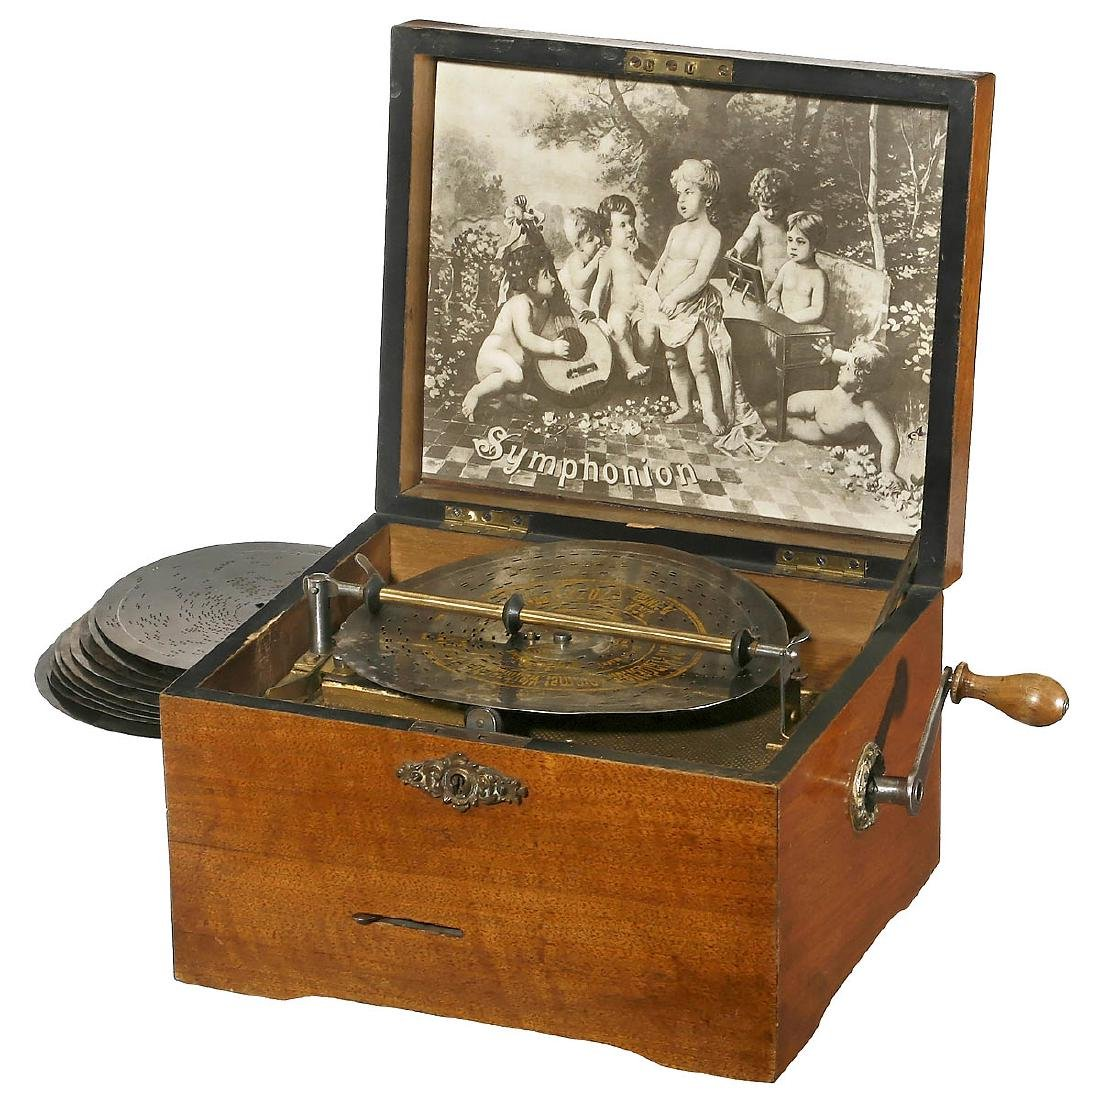 Symphonion Disc Musical Box, c. 1900